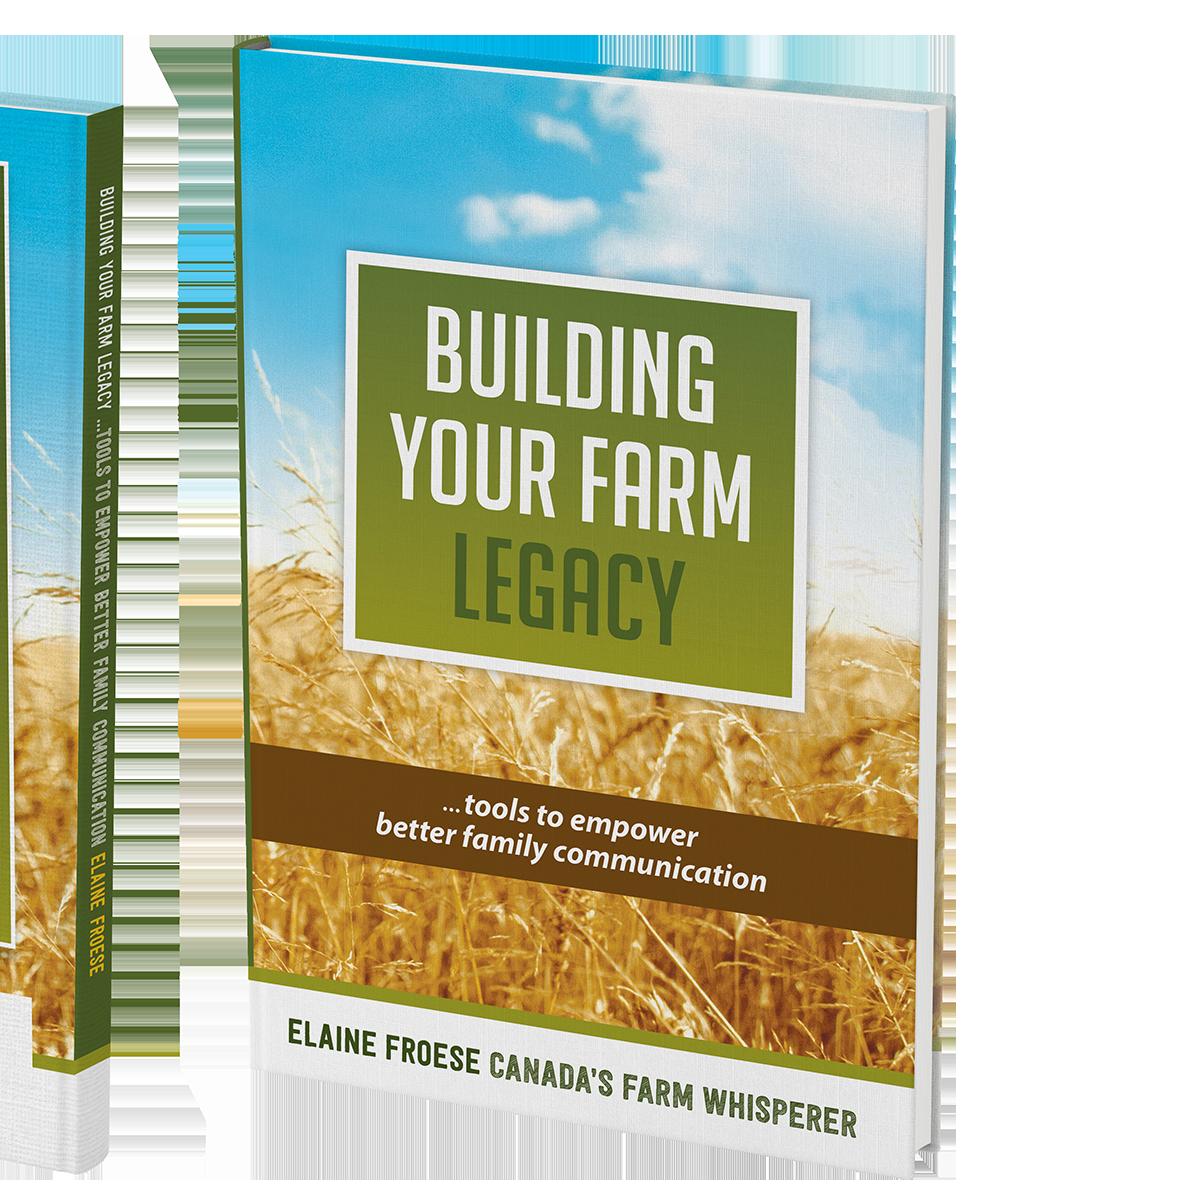 Building Your Farm Legacy